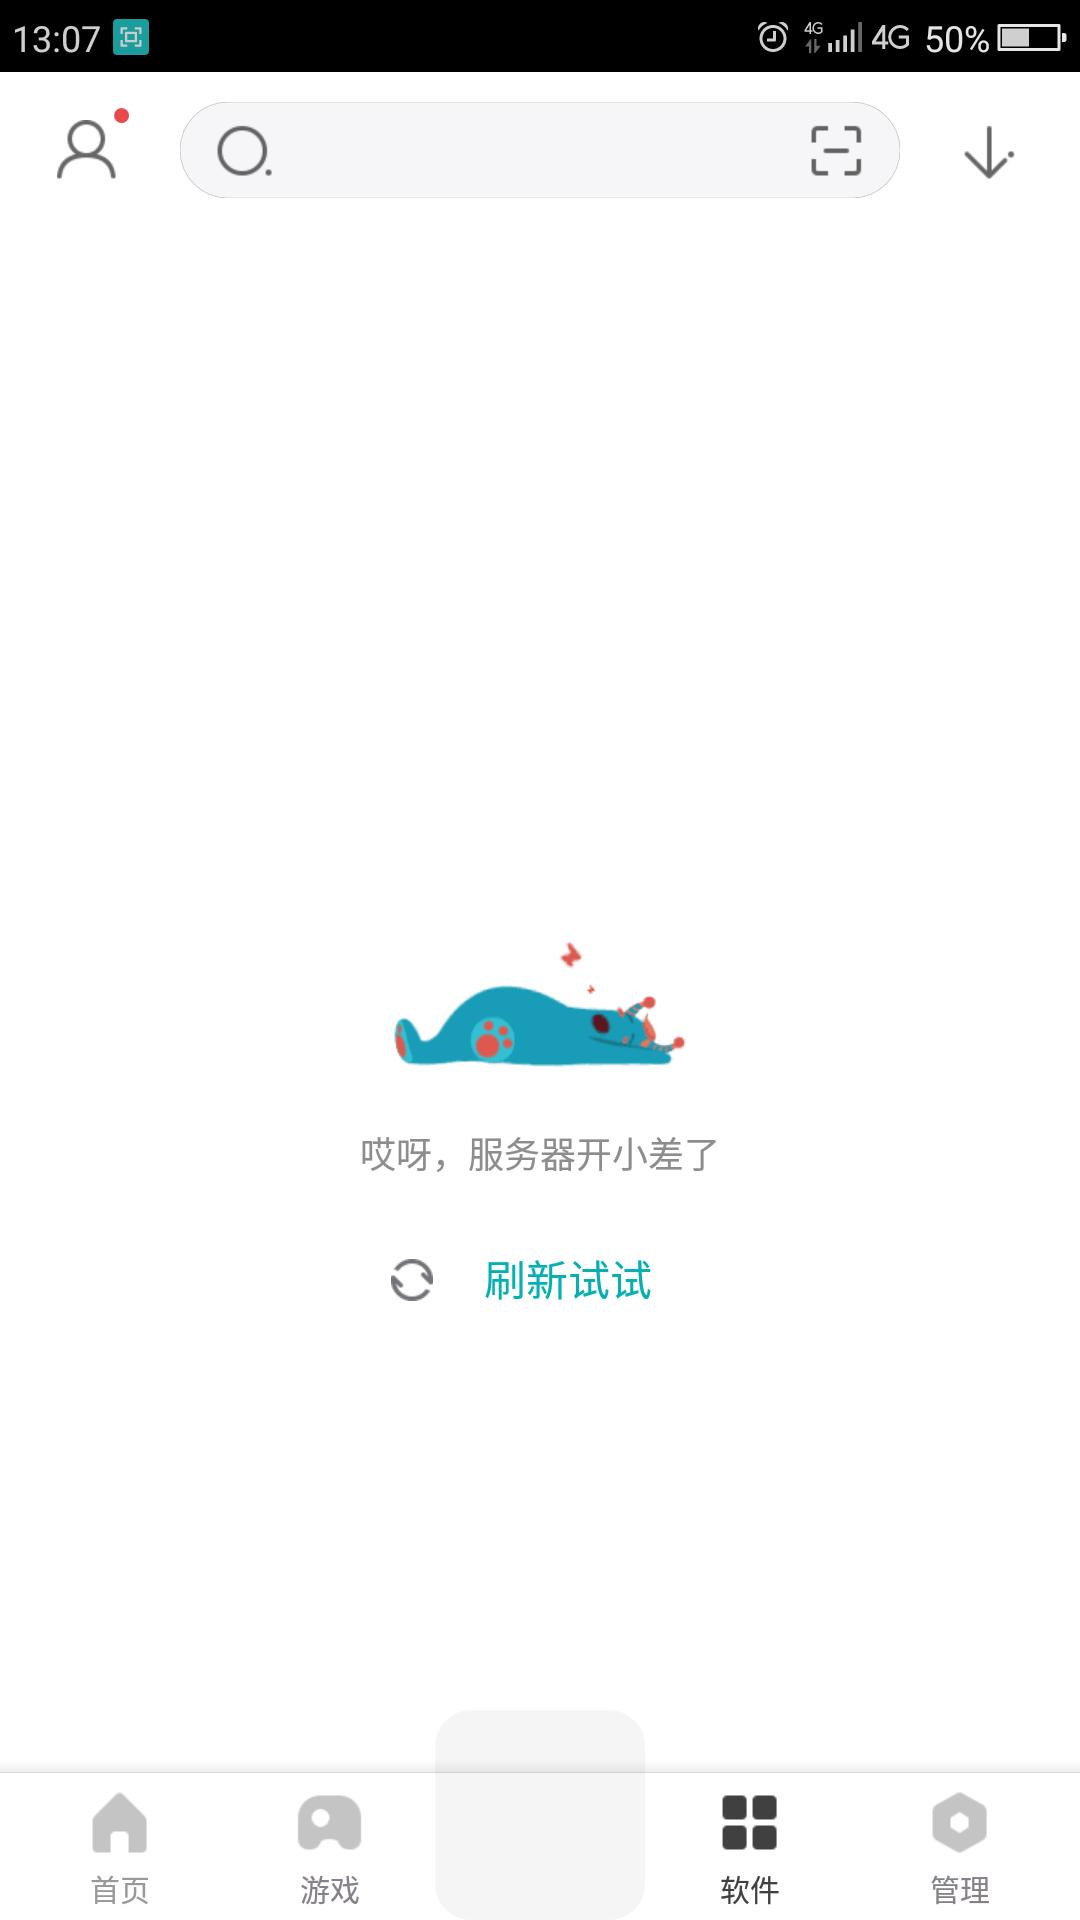 Screenshot_2019-08-08-13-07-49.png